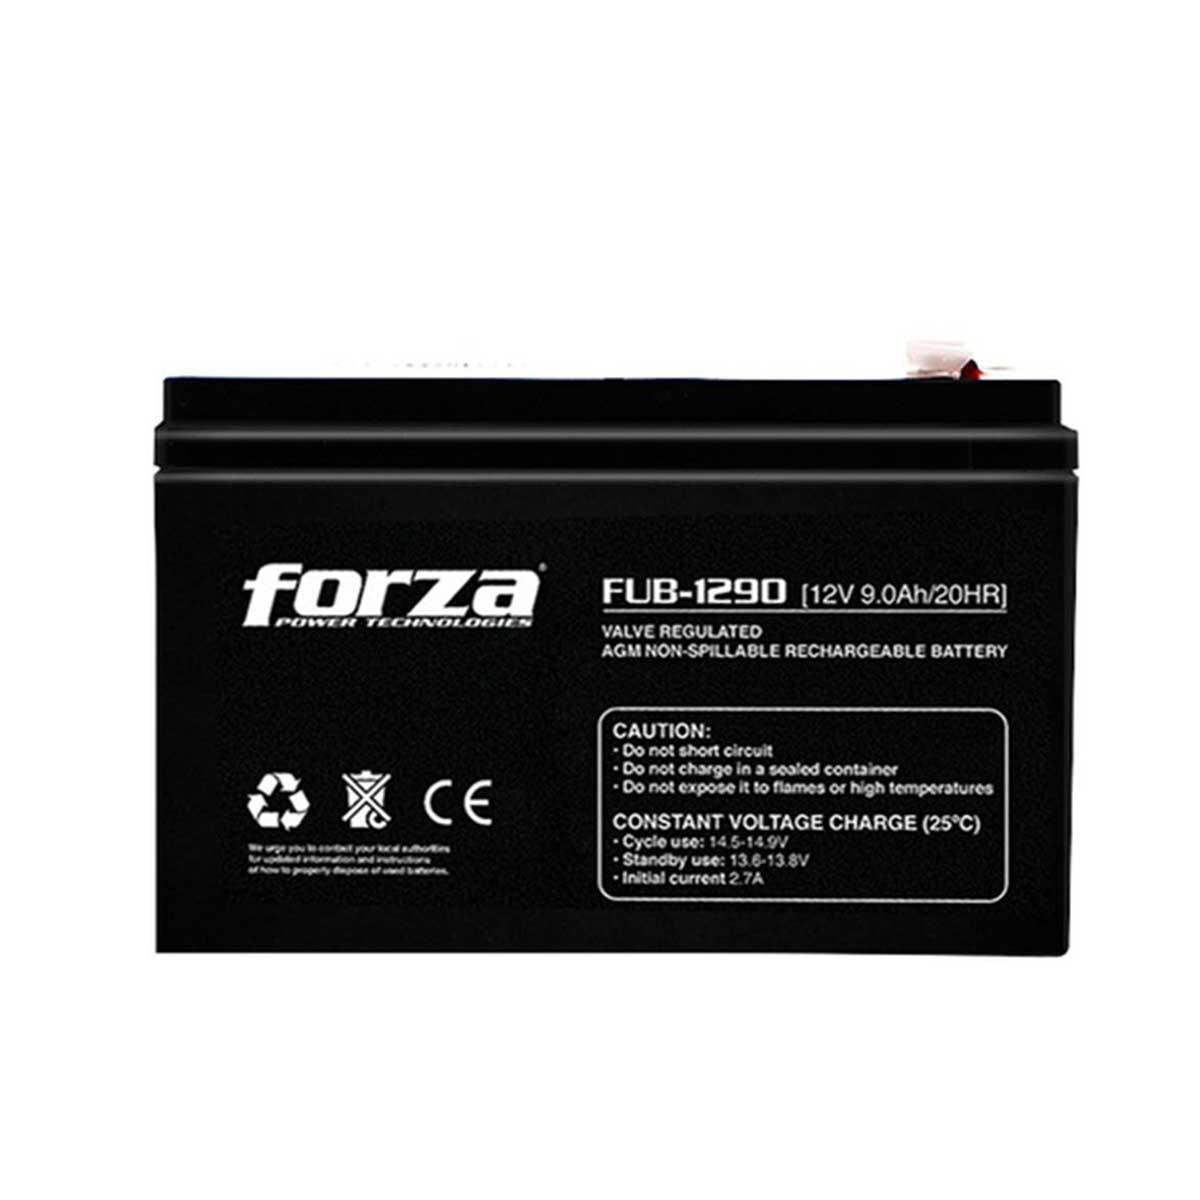 Batería Forza FUB-1290 12V 9AH